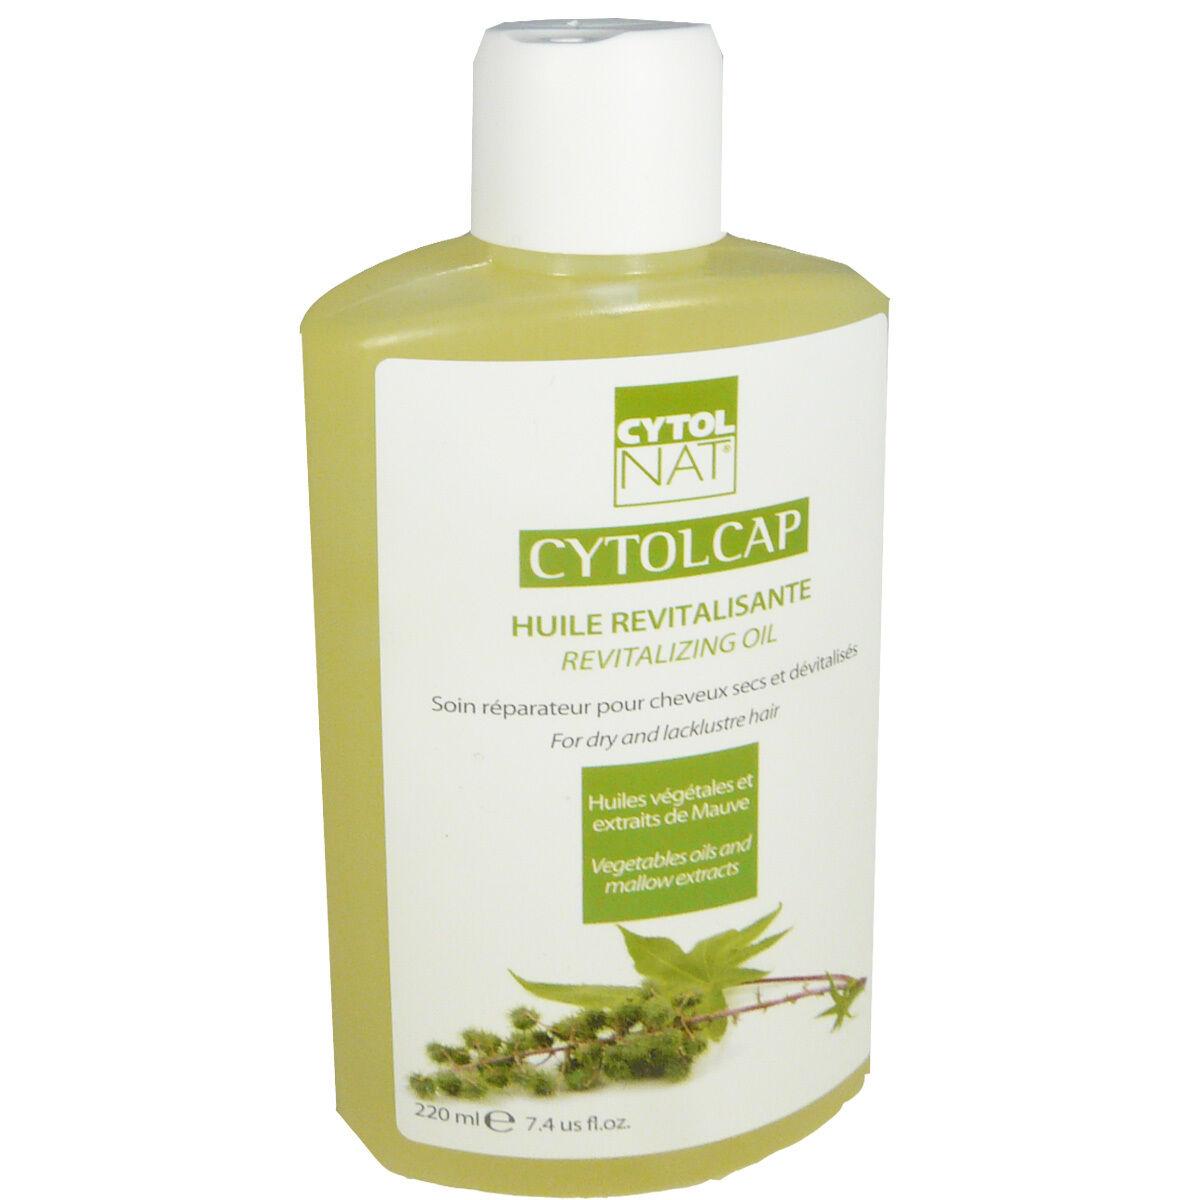 Cytolnat cytolcap soin huile revitalisante 220 ml